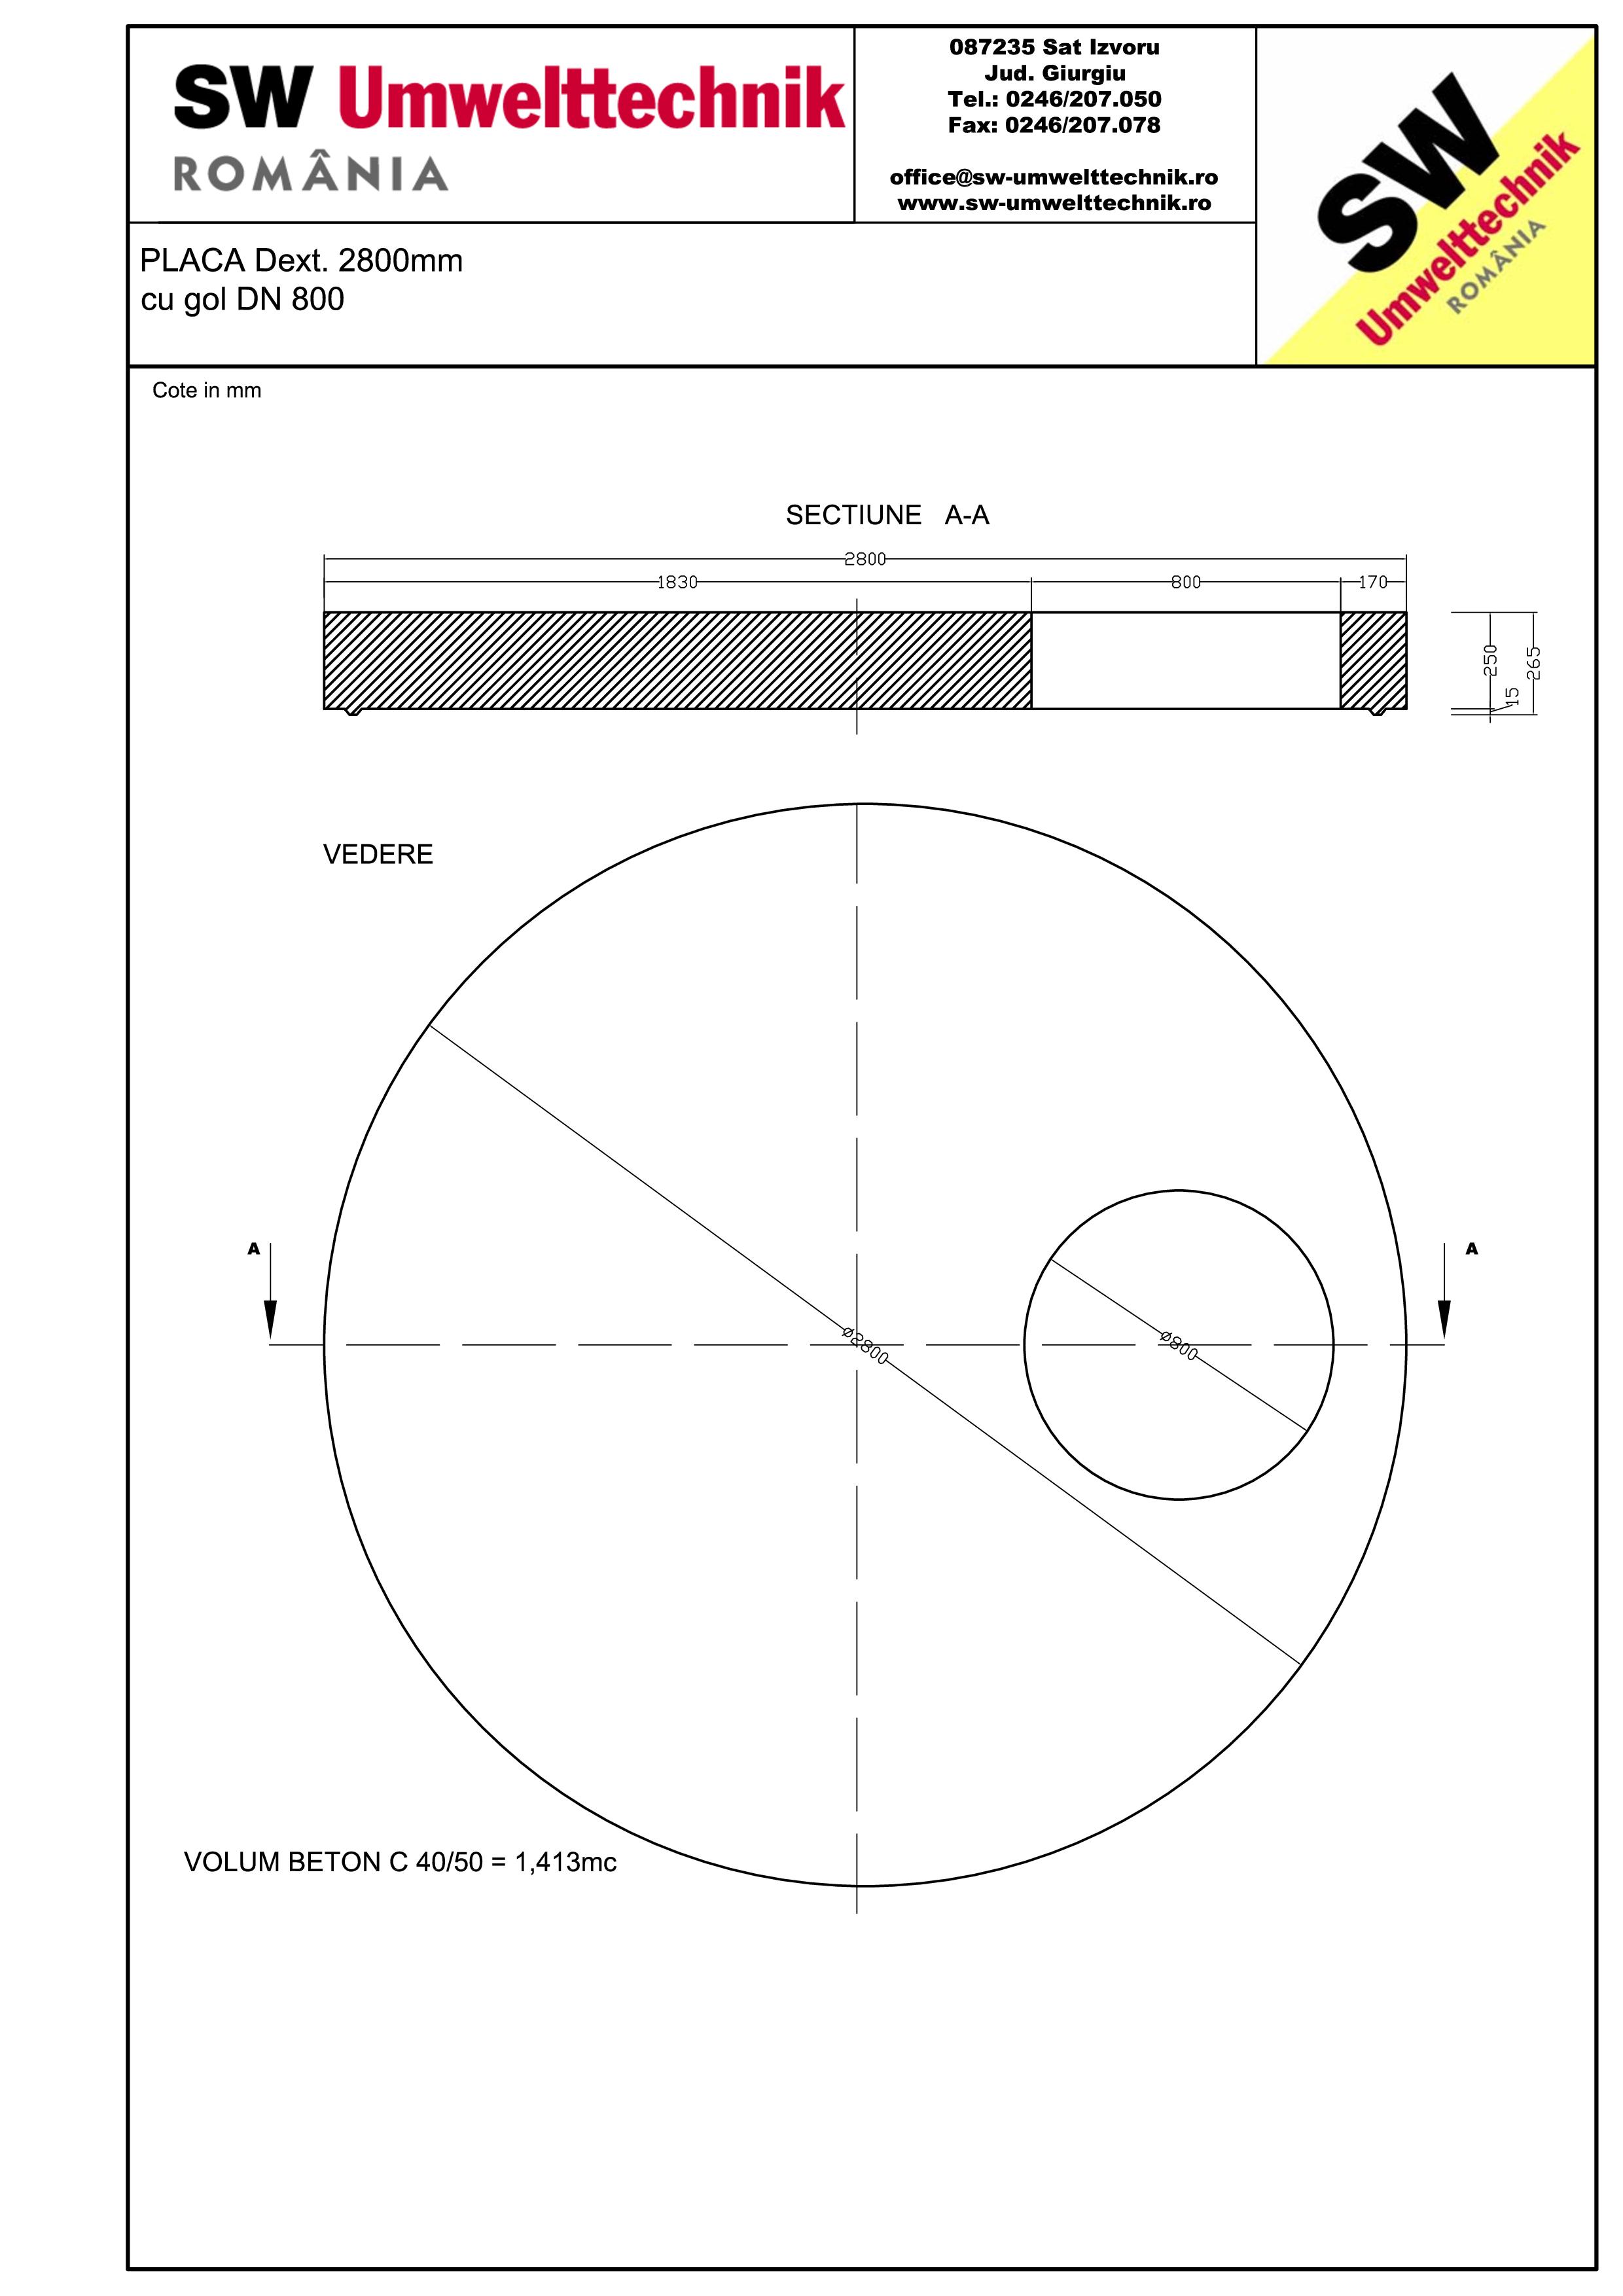 Pagina 1 - CAD-PDF Placa Dext. 2800 H250 cu gol DN800 SW UMWELTTECHNIK Detaliu de produs